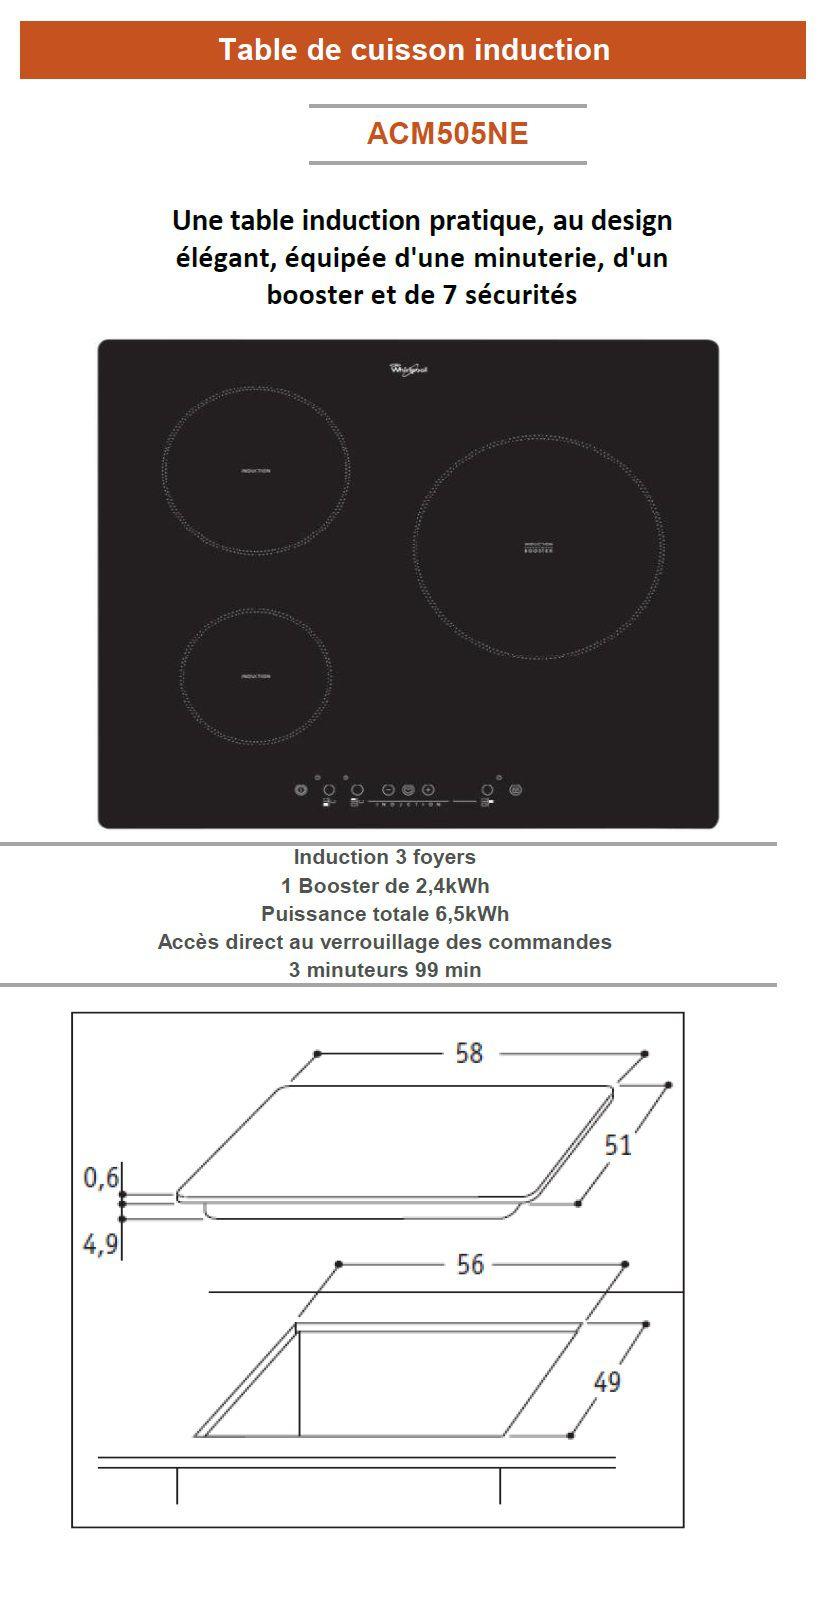 Whirlpool acm505ne table de cuisson induction 3 zones for Table de cuisson induction whirlpool